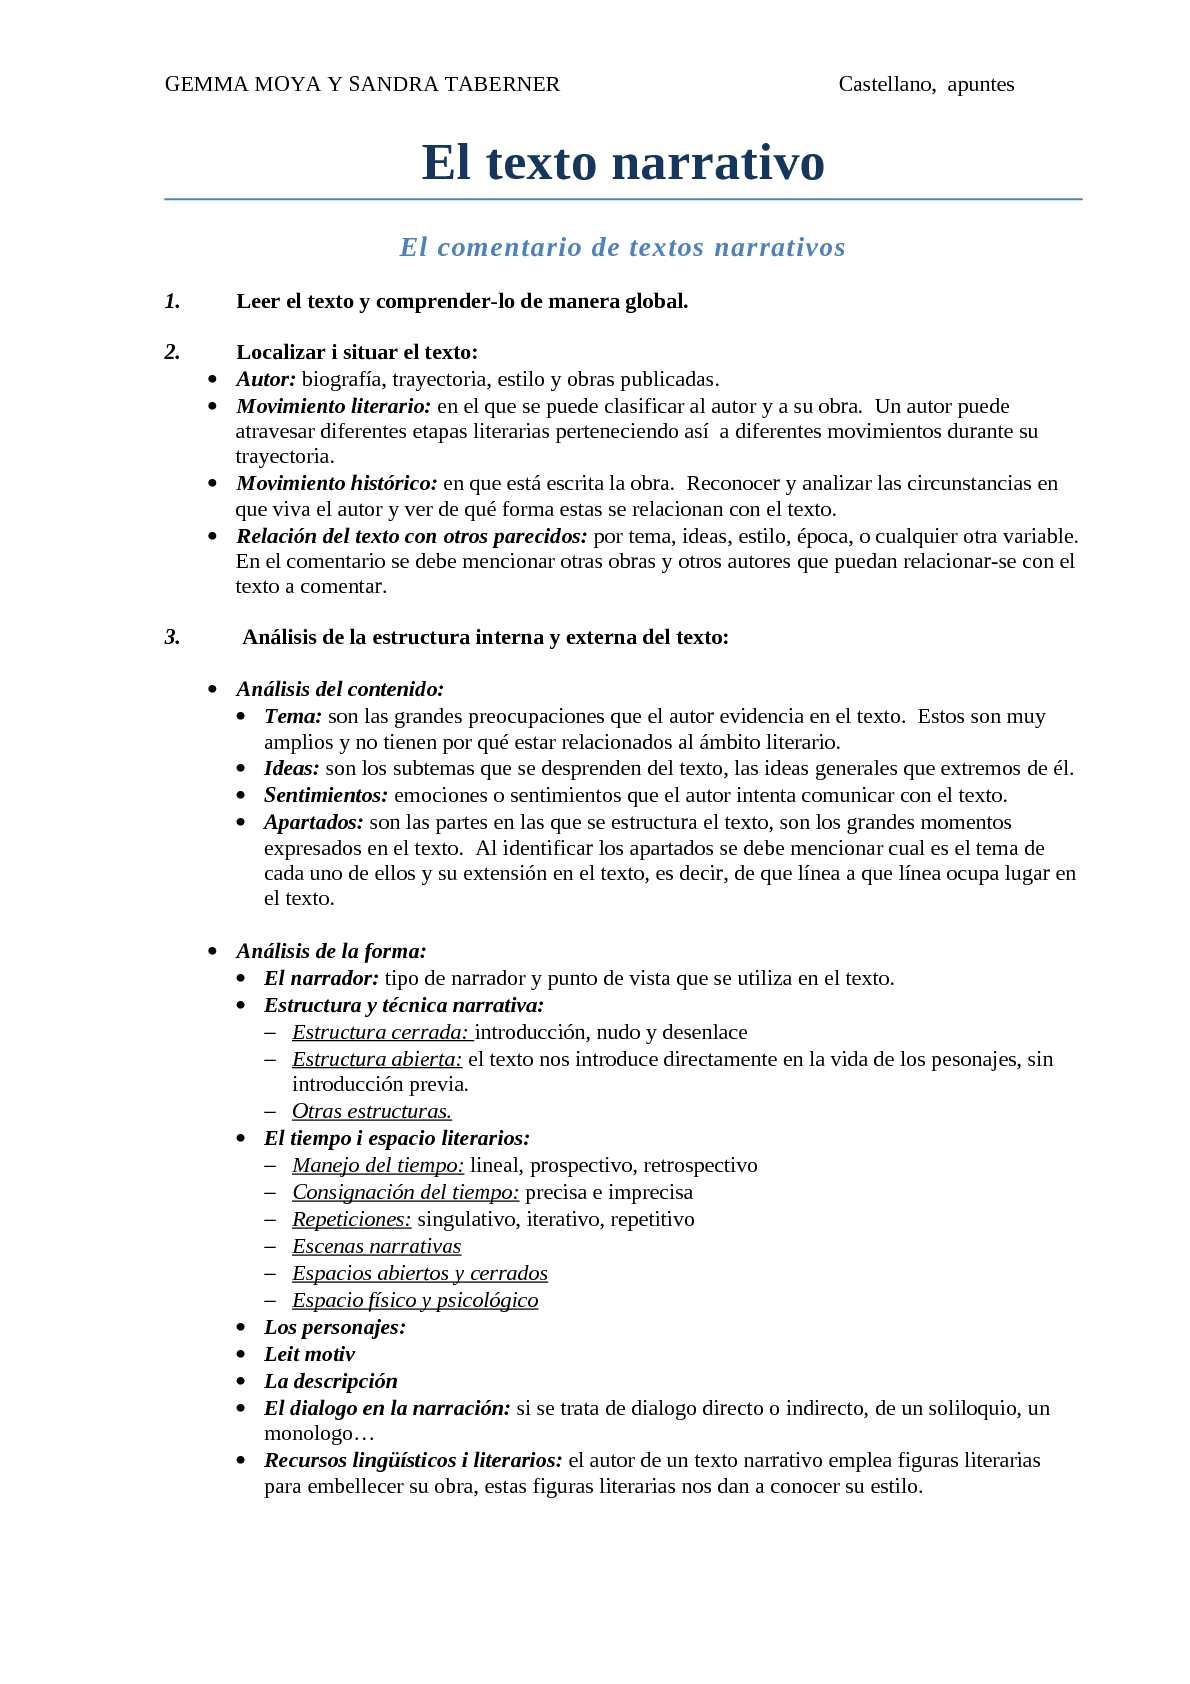 Calaméo Castellano Apuntes Textos Narrativos